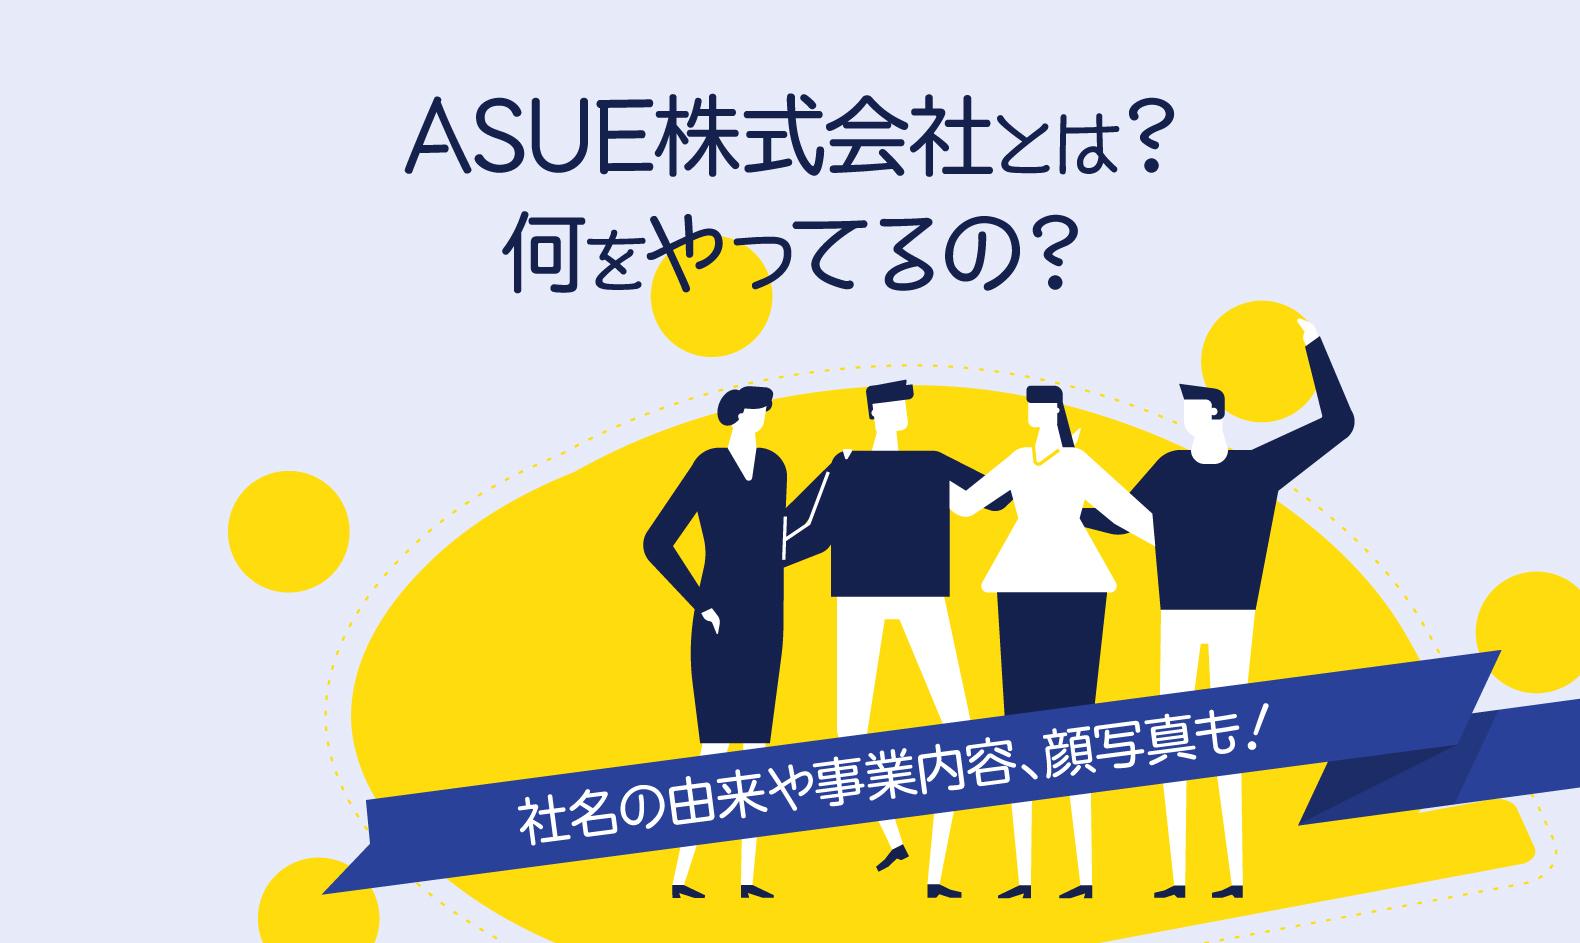 ASUE株式会社とは?何をやってるの?社名の由来や事業内容、顔写真も!